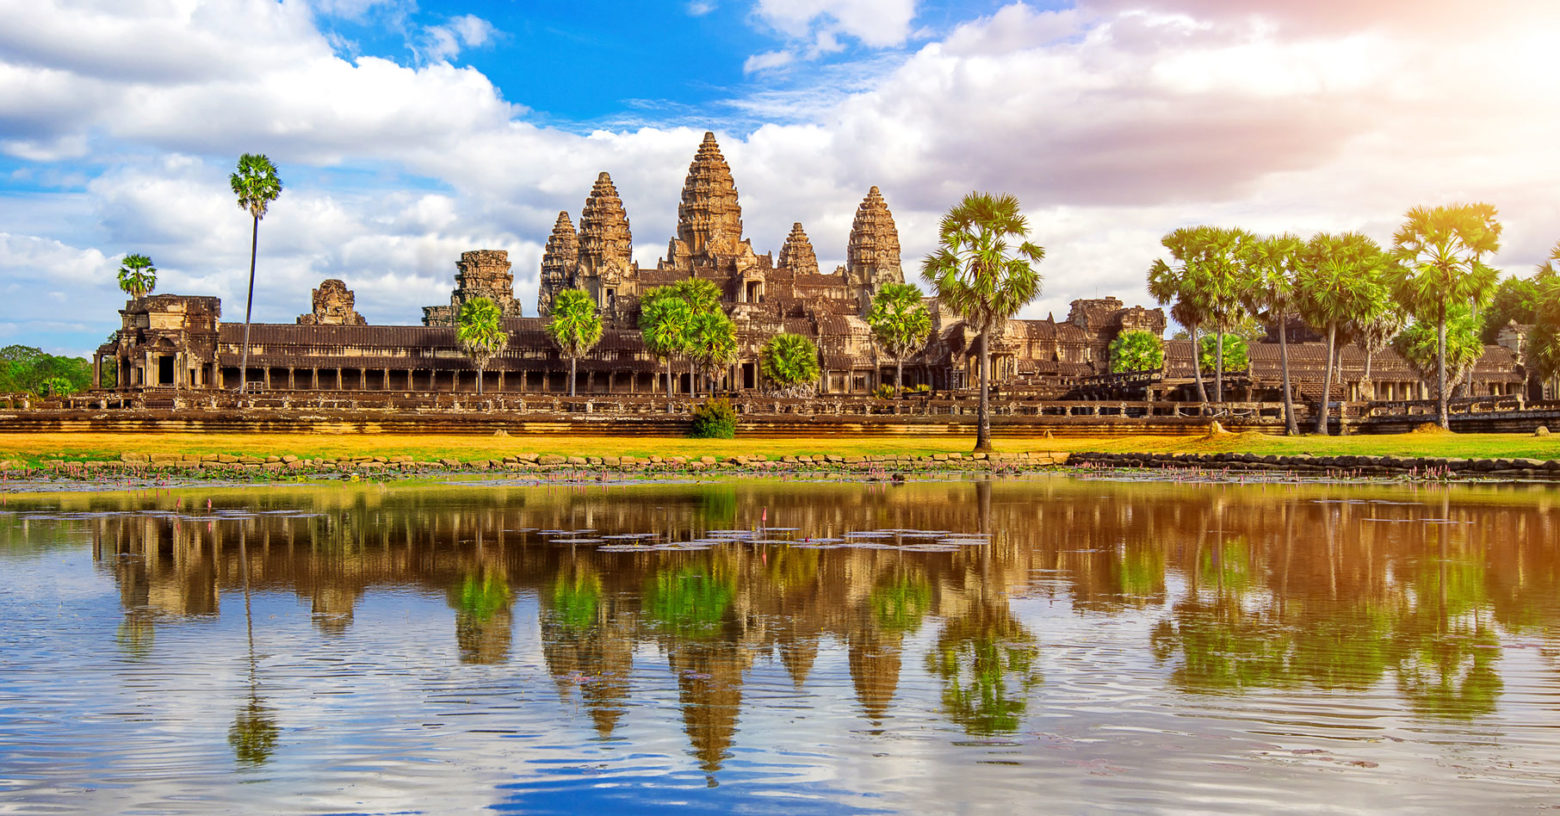 Website-Blog-Iconic-Life-Uniworld-Angkor-Wat-Cambodia-shutterstock-Guitar-photographer-1560x816